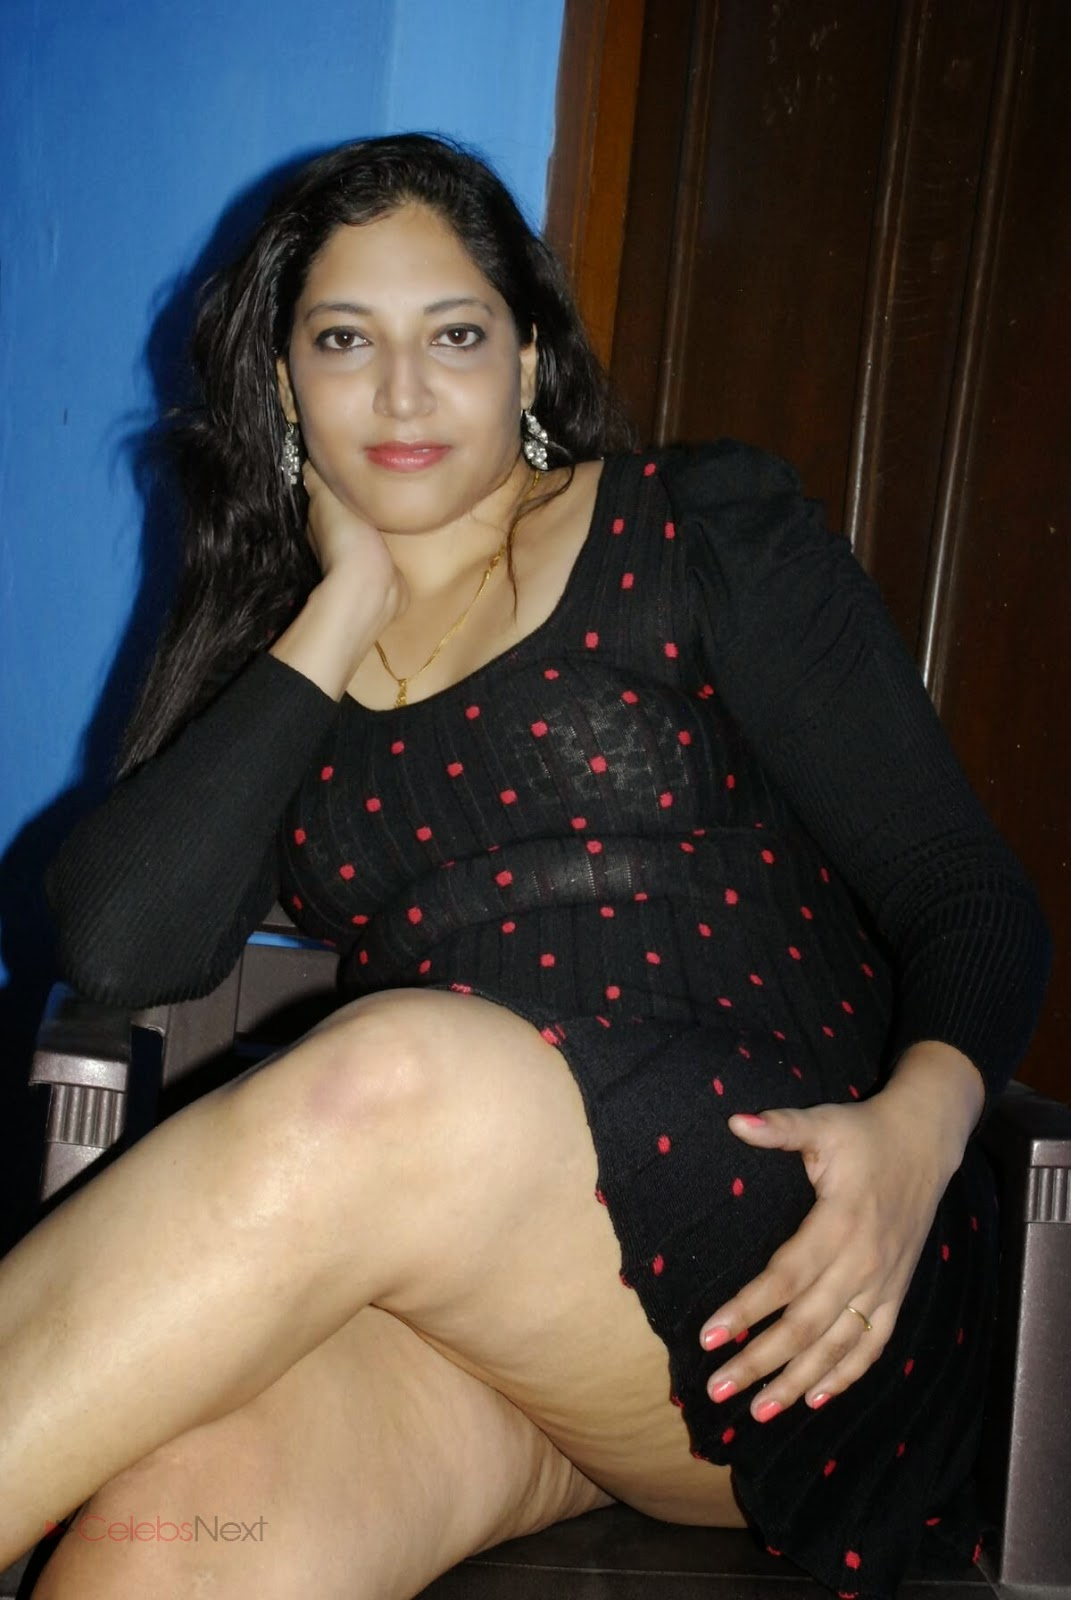 tharuna latest hot photo gallery celebsnext bollywood